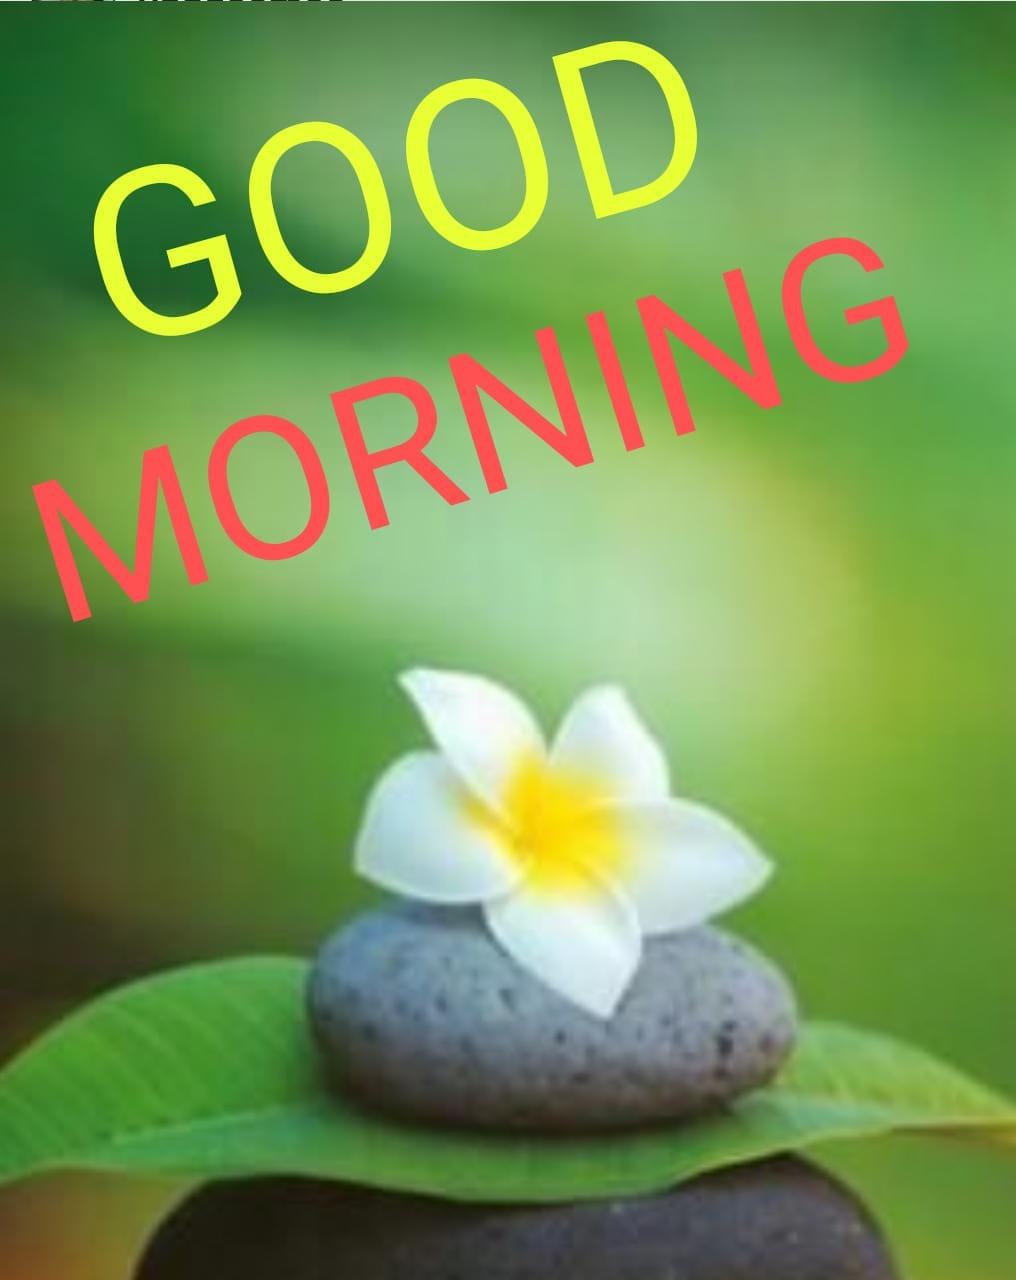 whatsapp-good-morning-english-36.jpg